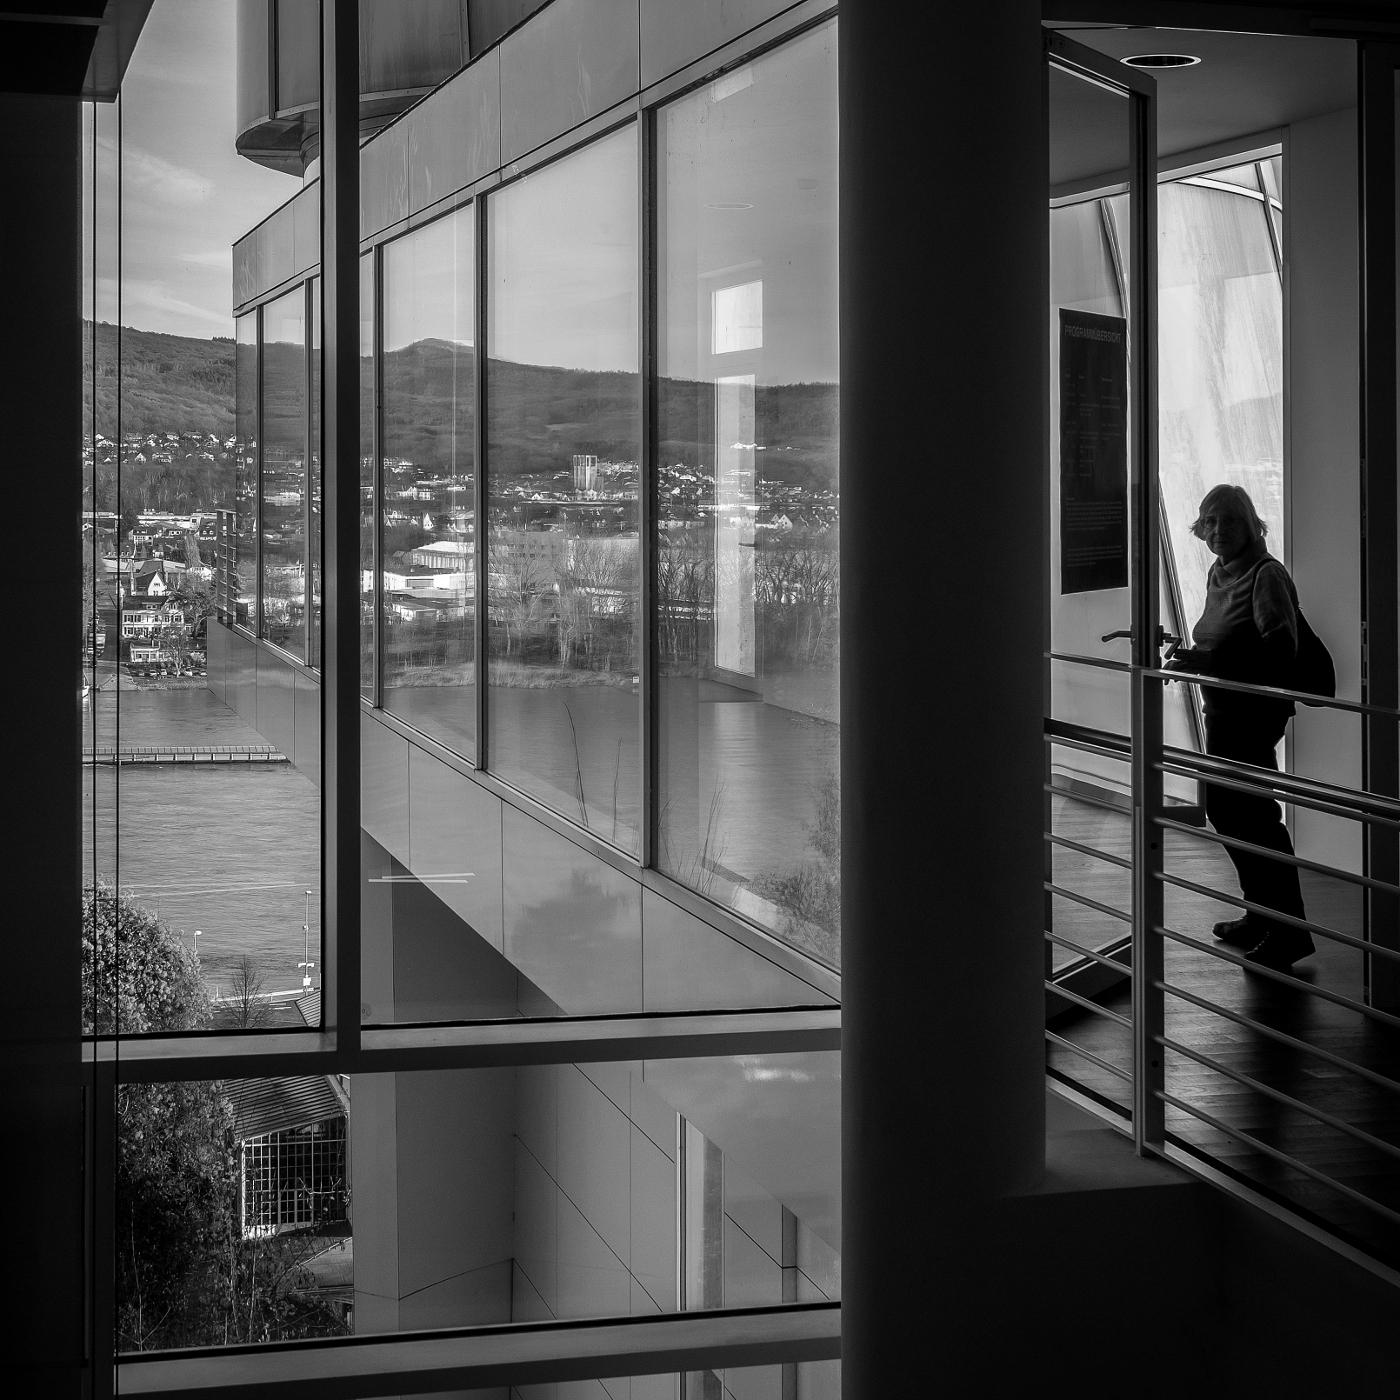 Arp Museum | Ausblick #2 | © wolfgang röser | worobo